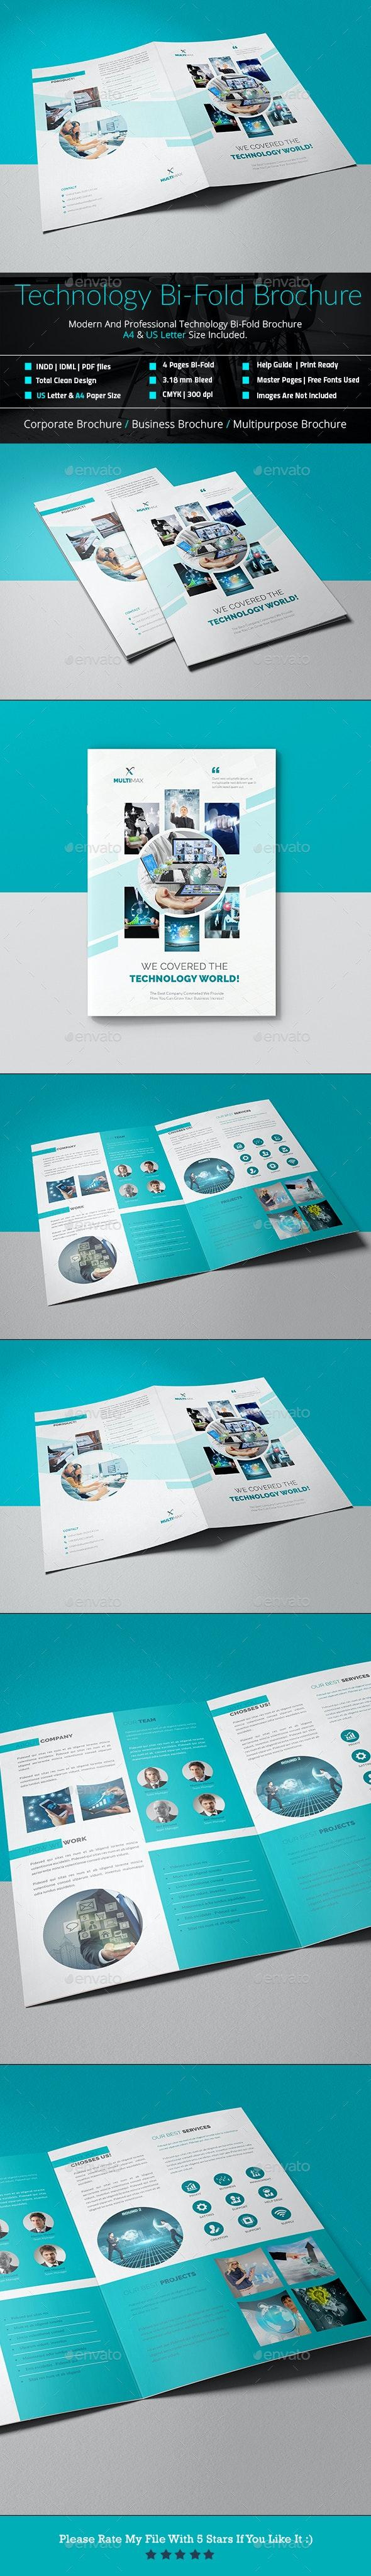 Bi-Fold Technology Brochure - Brochures Print Templates